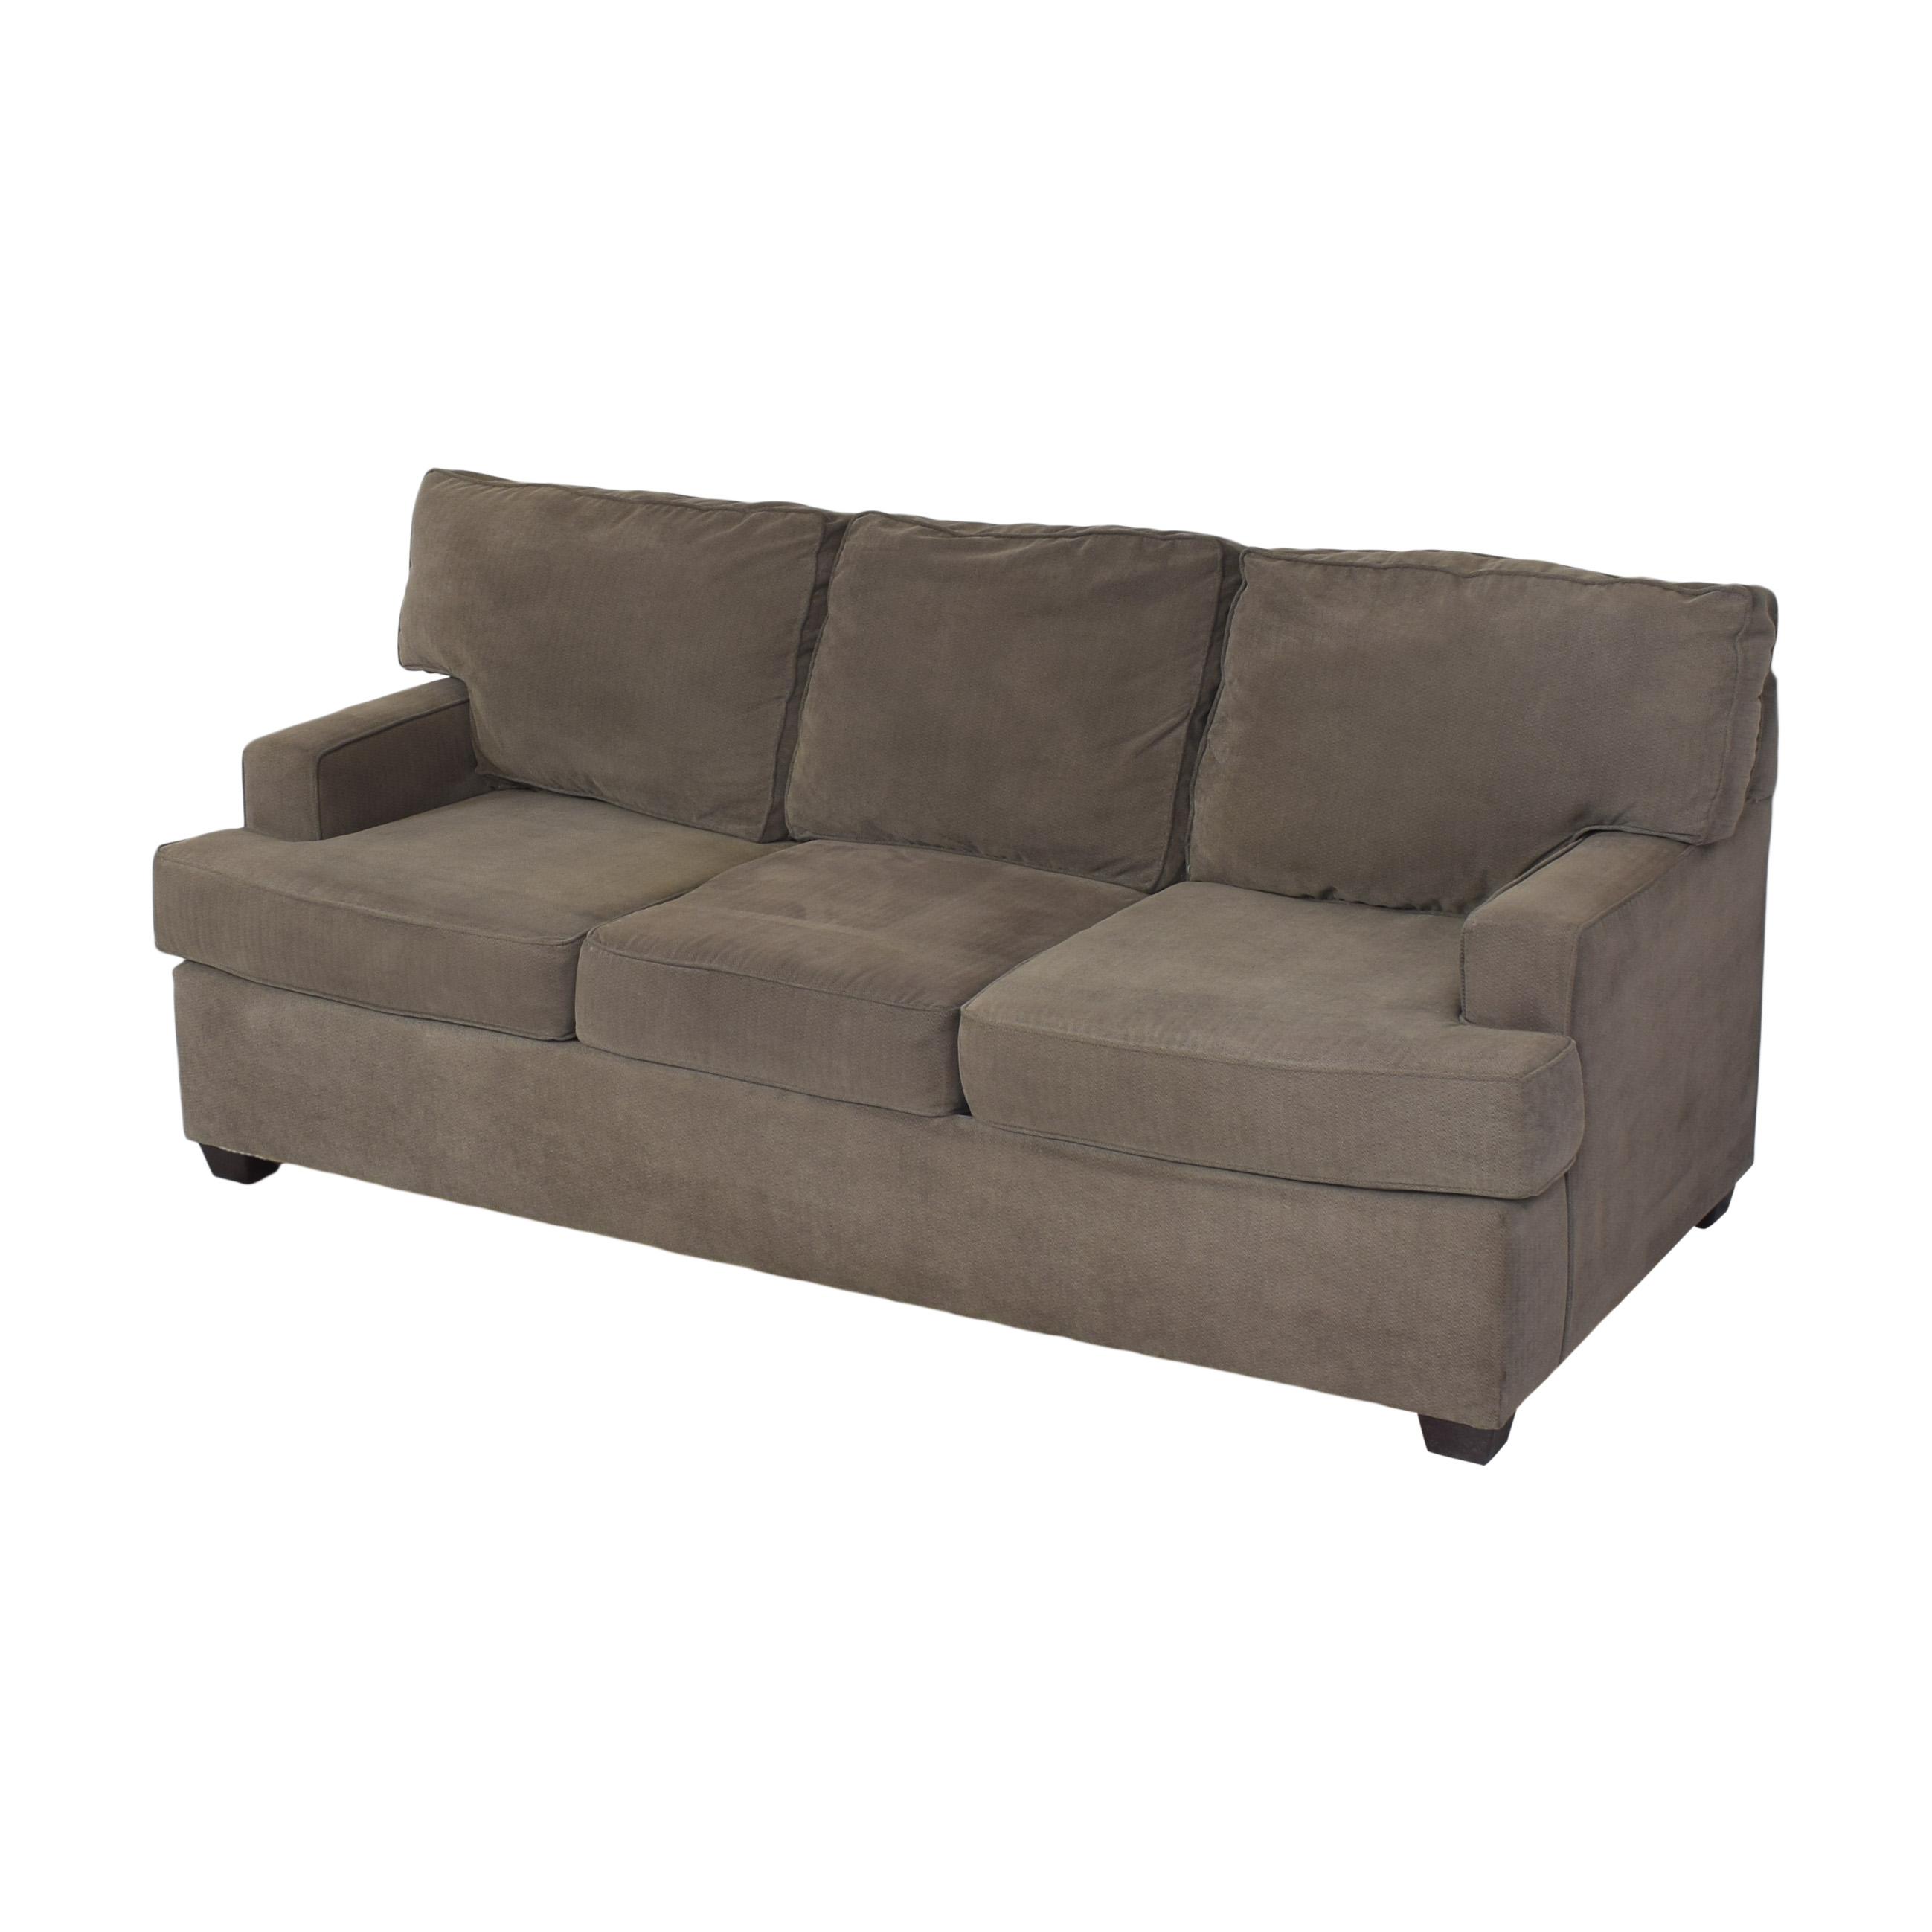 buy Klaussner Cruze Sofa Klaussner Classic Sofas